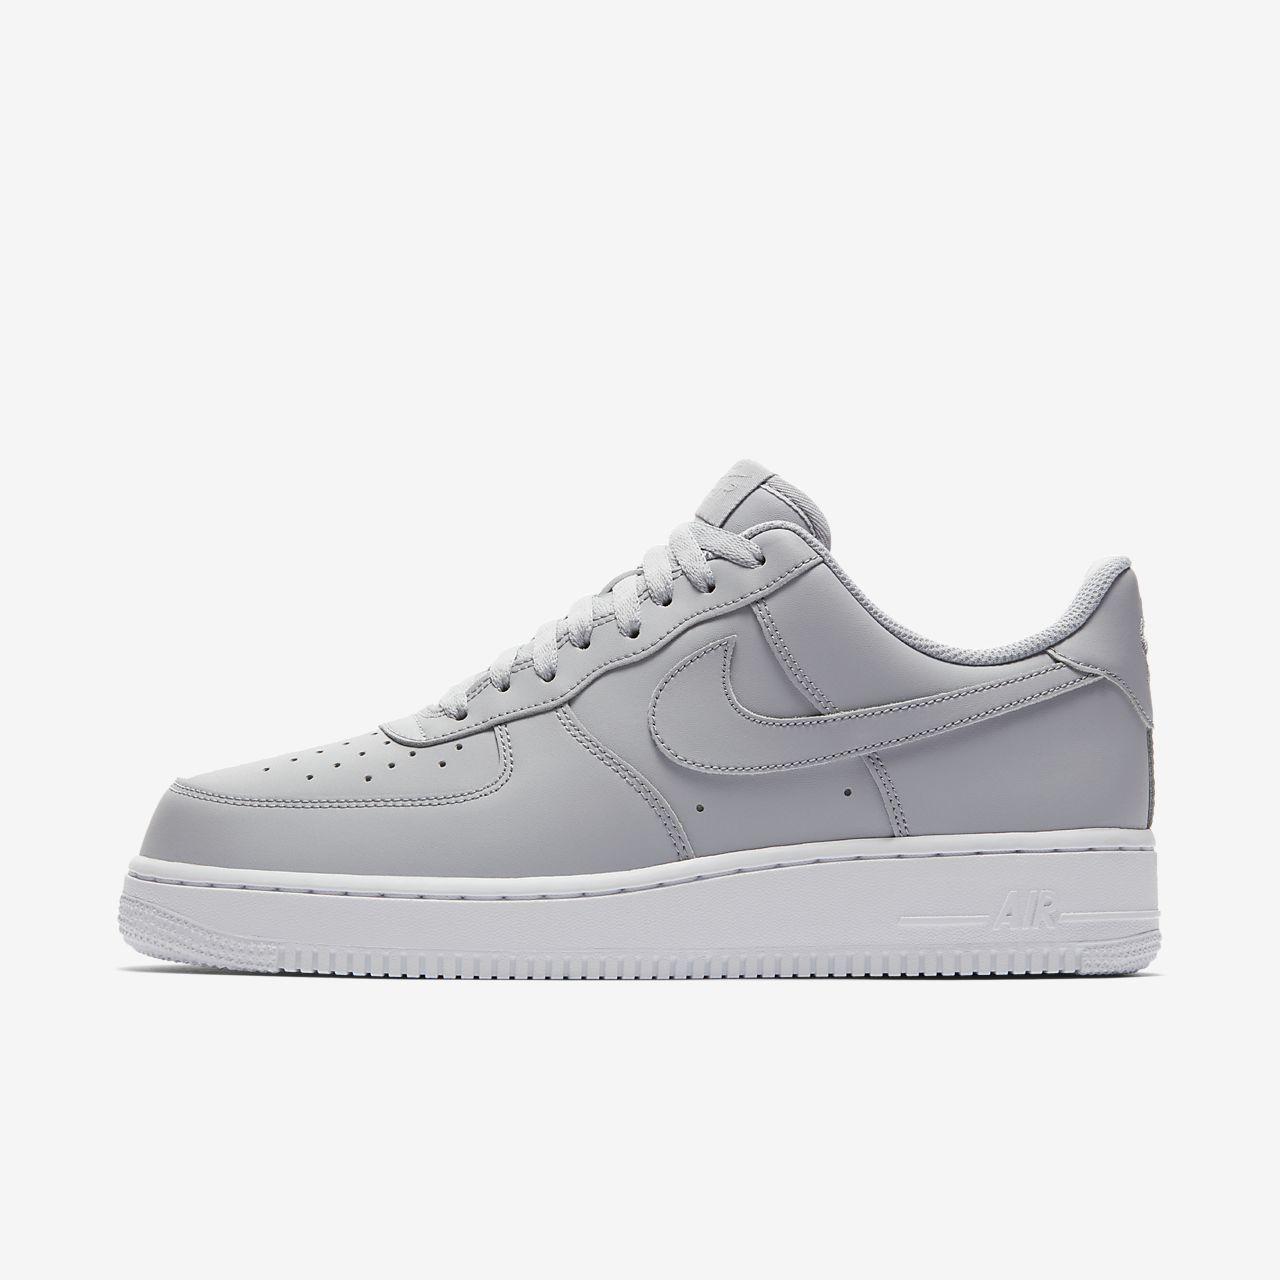 Nike Air Force 1 HI Premium női sportcipő, Wolf Grey, 39